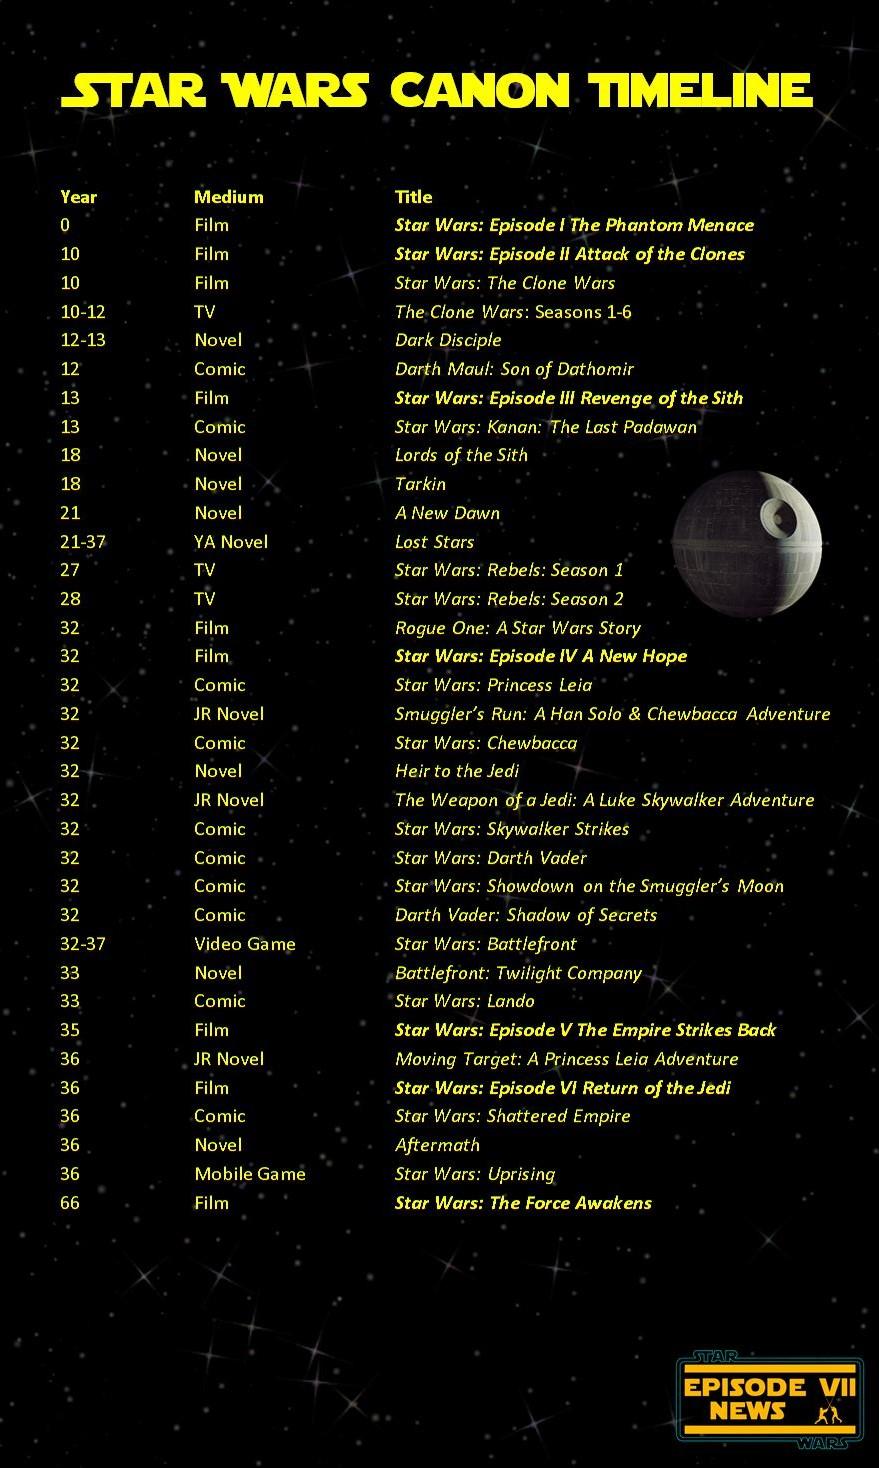 canon-timeline-star-wars